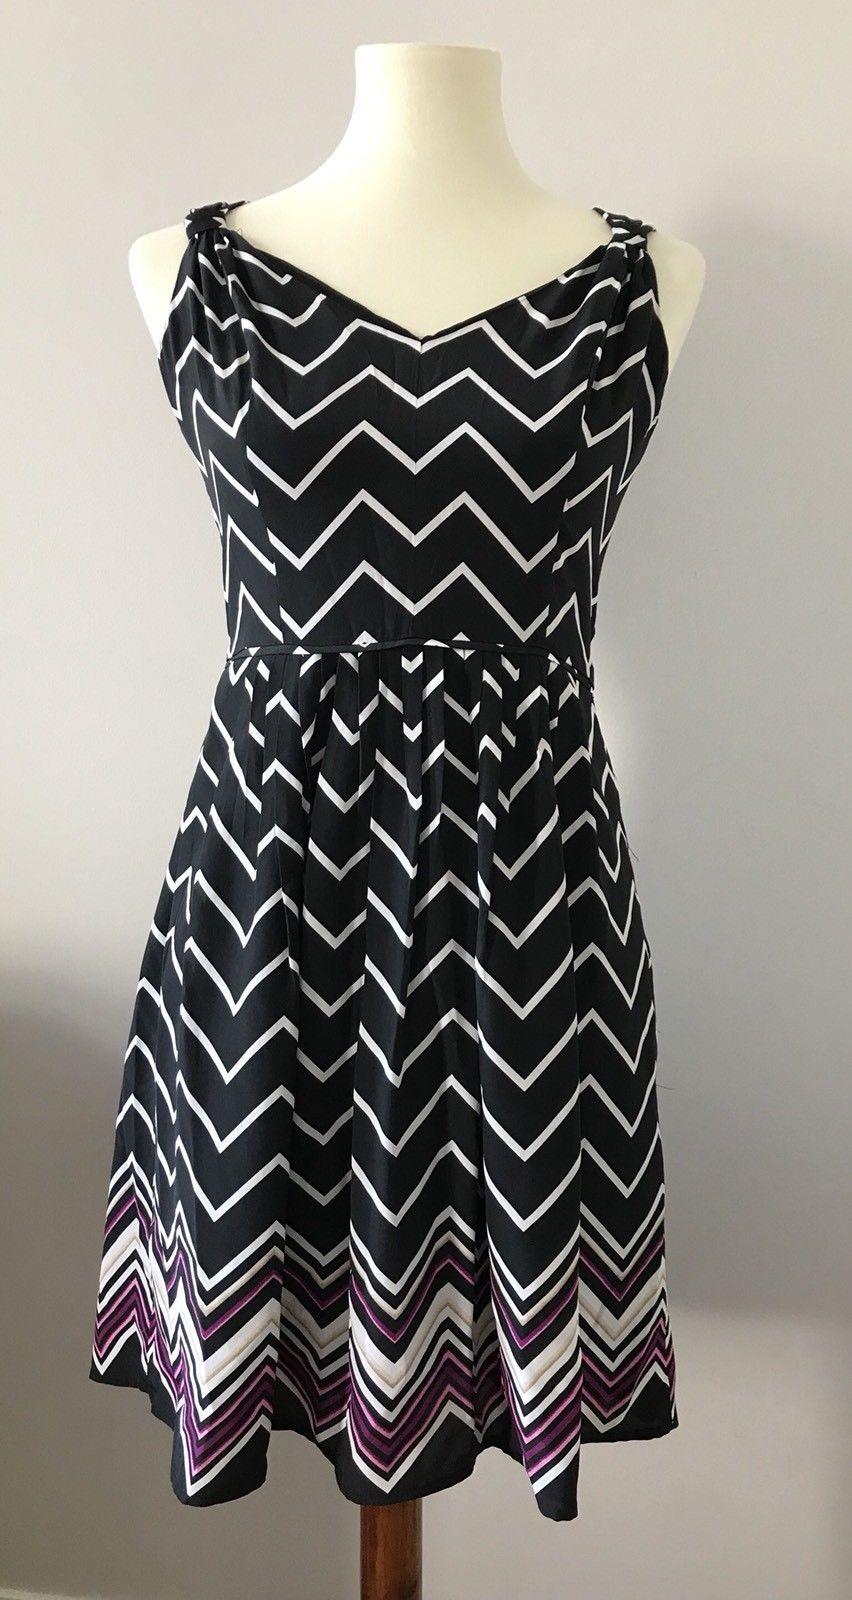 a63de68aec White House Black Market Women s Romantic Fit   Flare Striped Silk Dress  Size 2